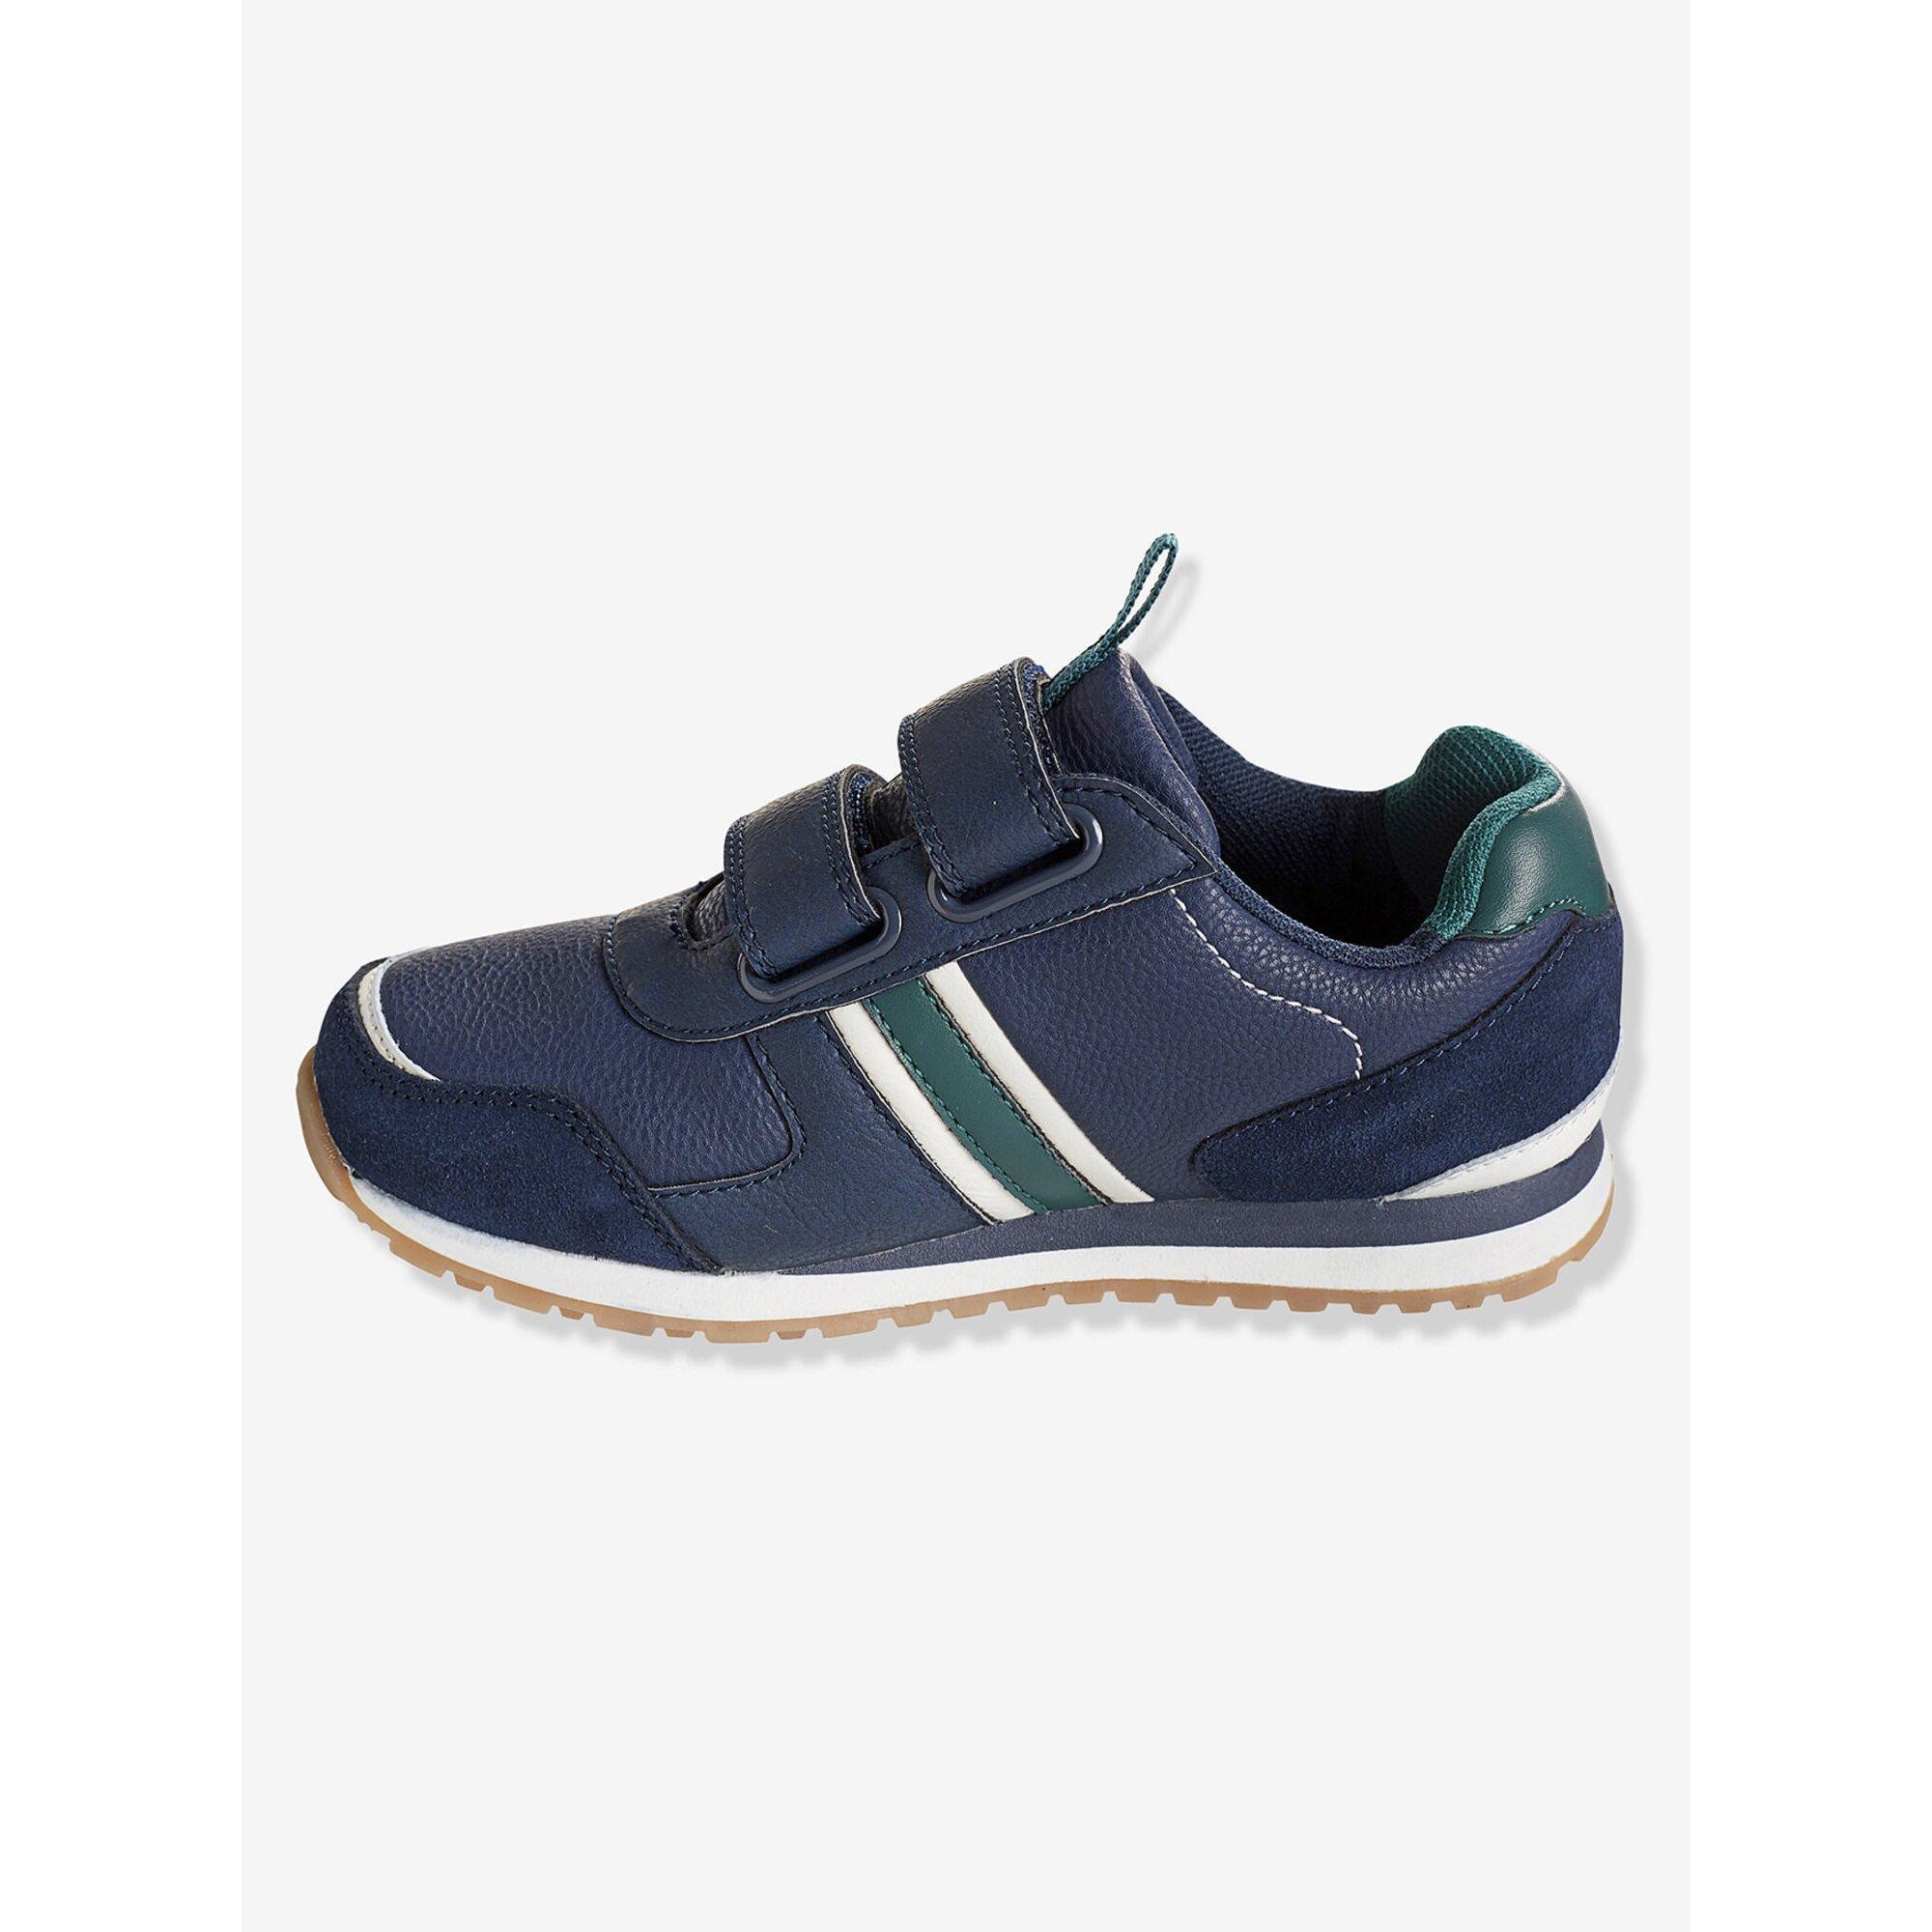 vertbaudet-sneakers-fur-jungen-klettverschluss, 40.99 EUR @ babywalz-de